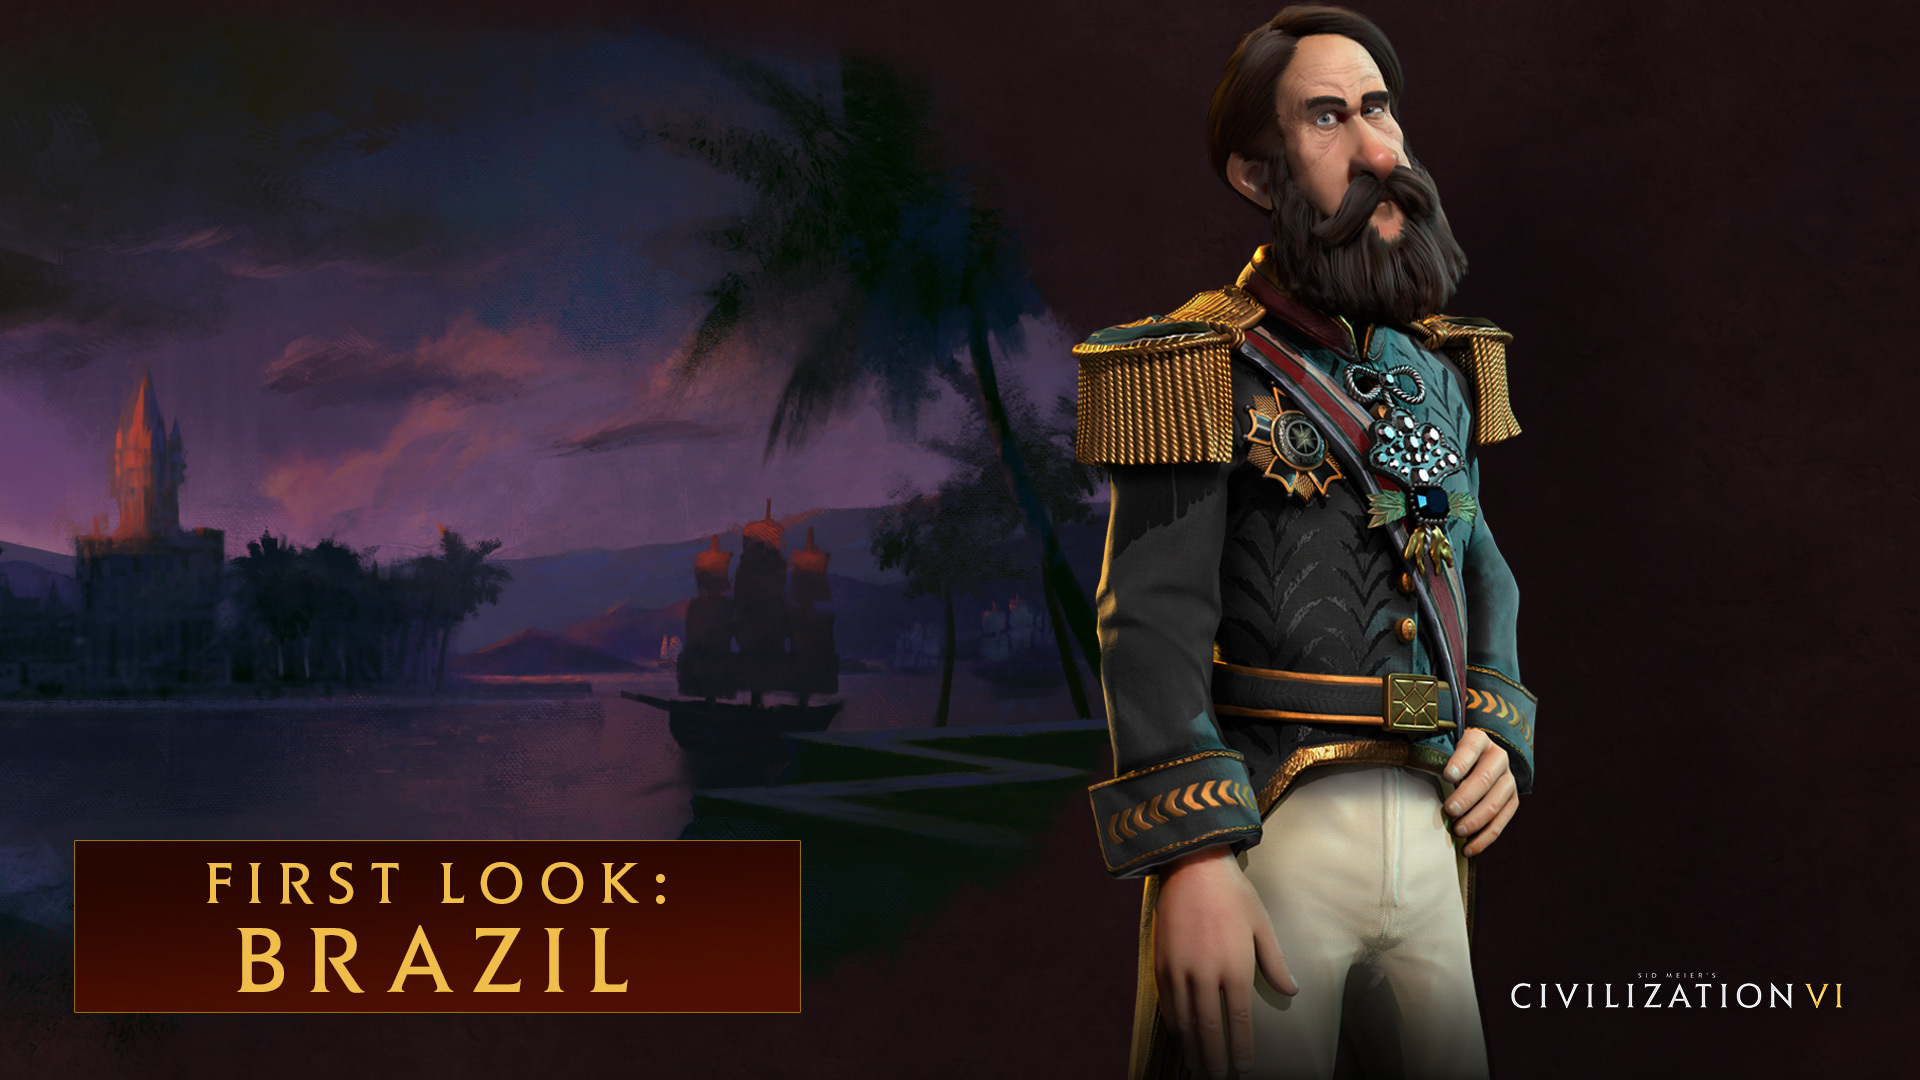 civilization 6 brazil